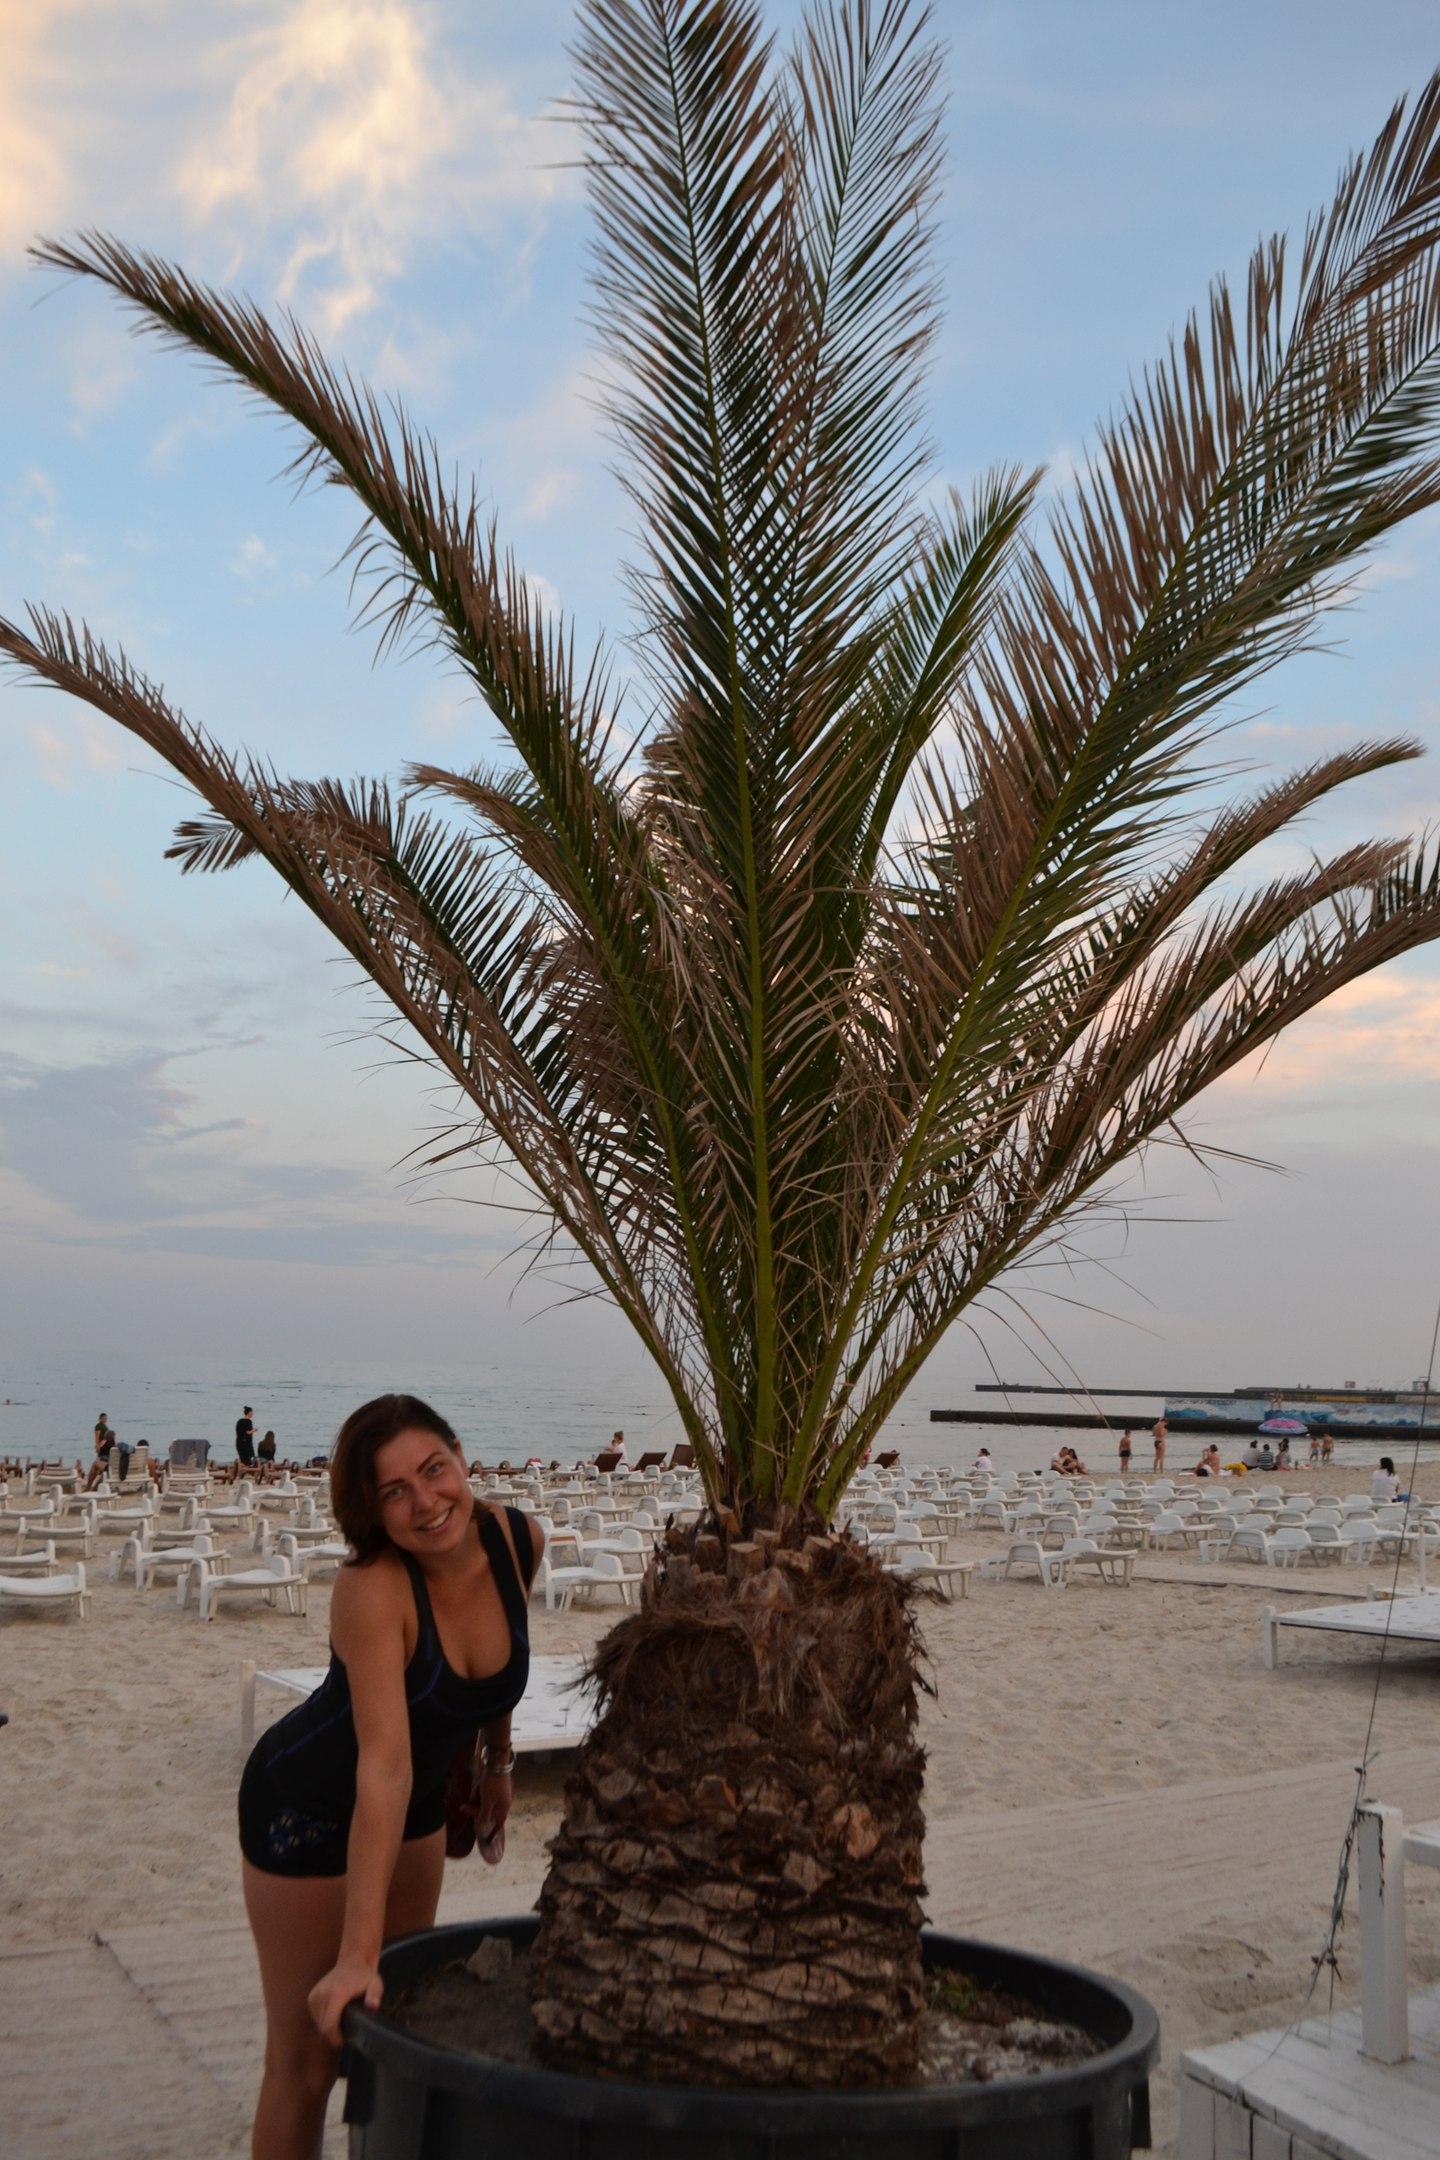 Елена Руденко (Валтея) Украина. Одесса. 17-21 августа 2016 г. 1rymsPQNj08